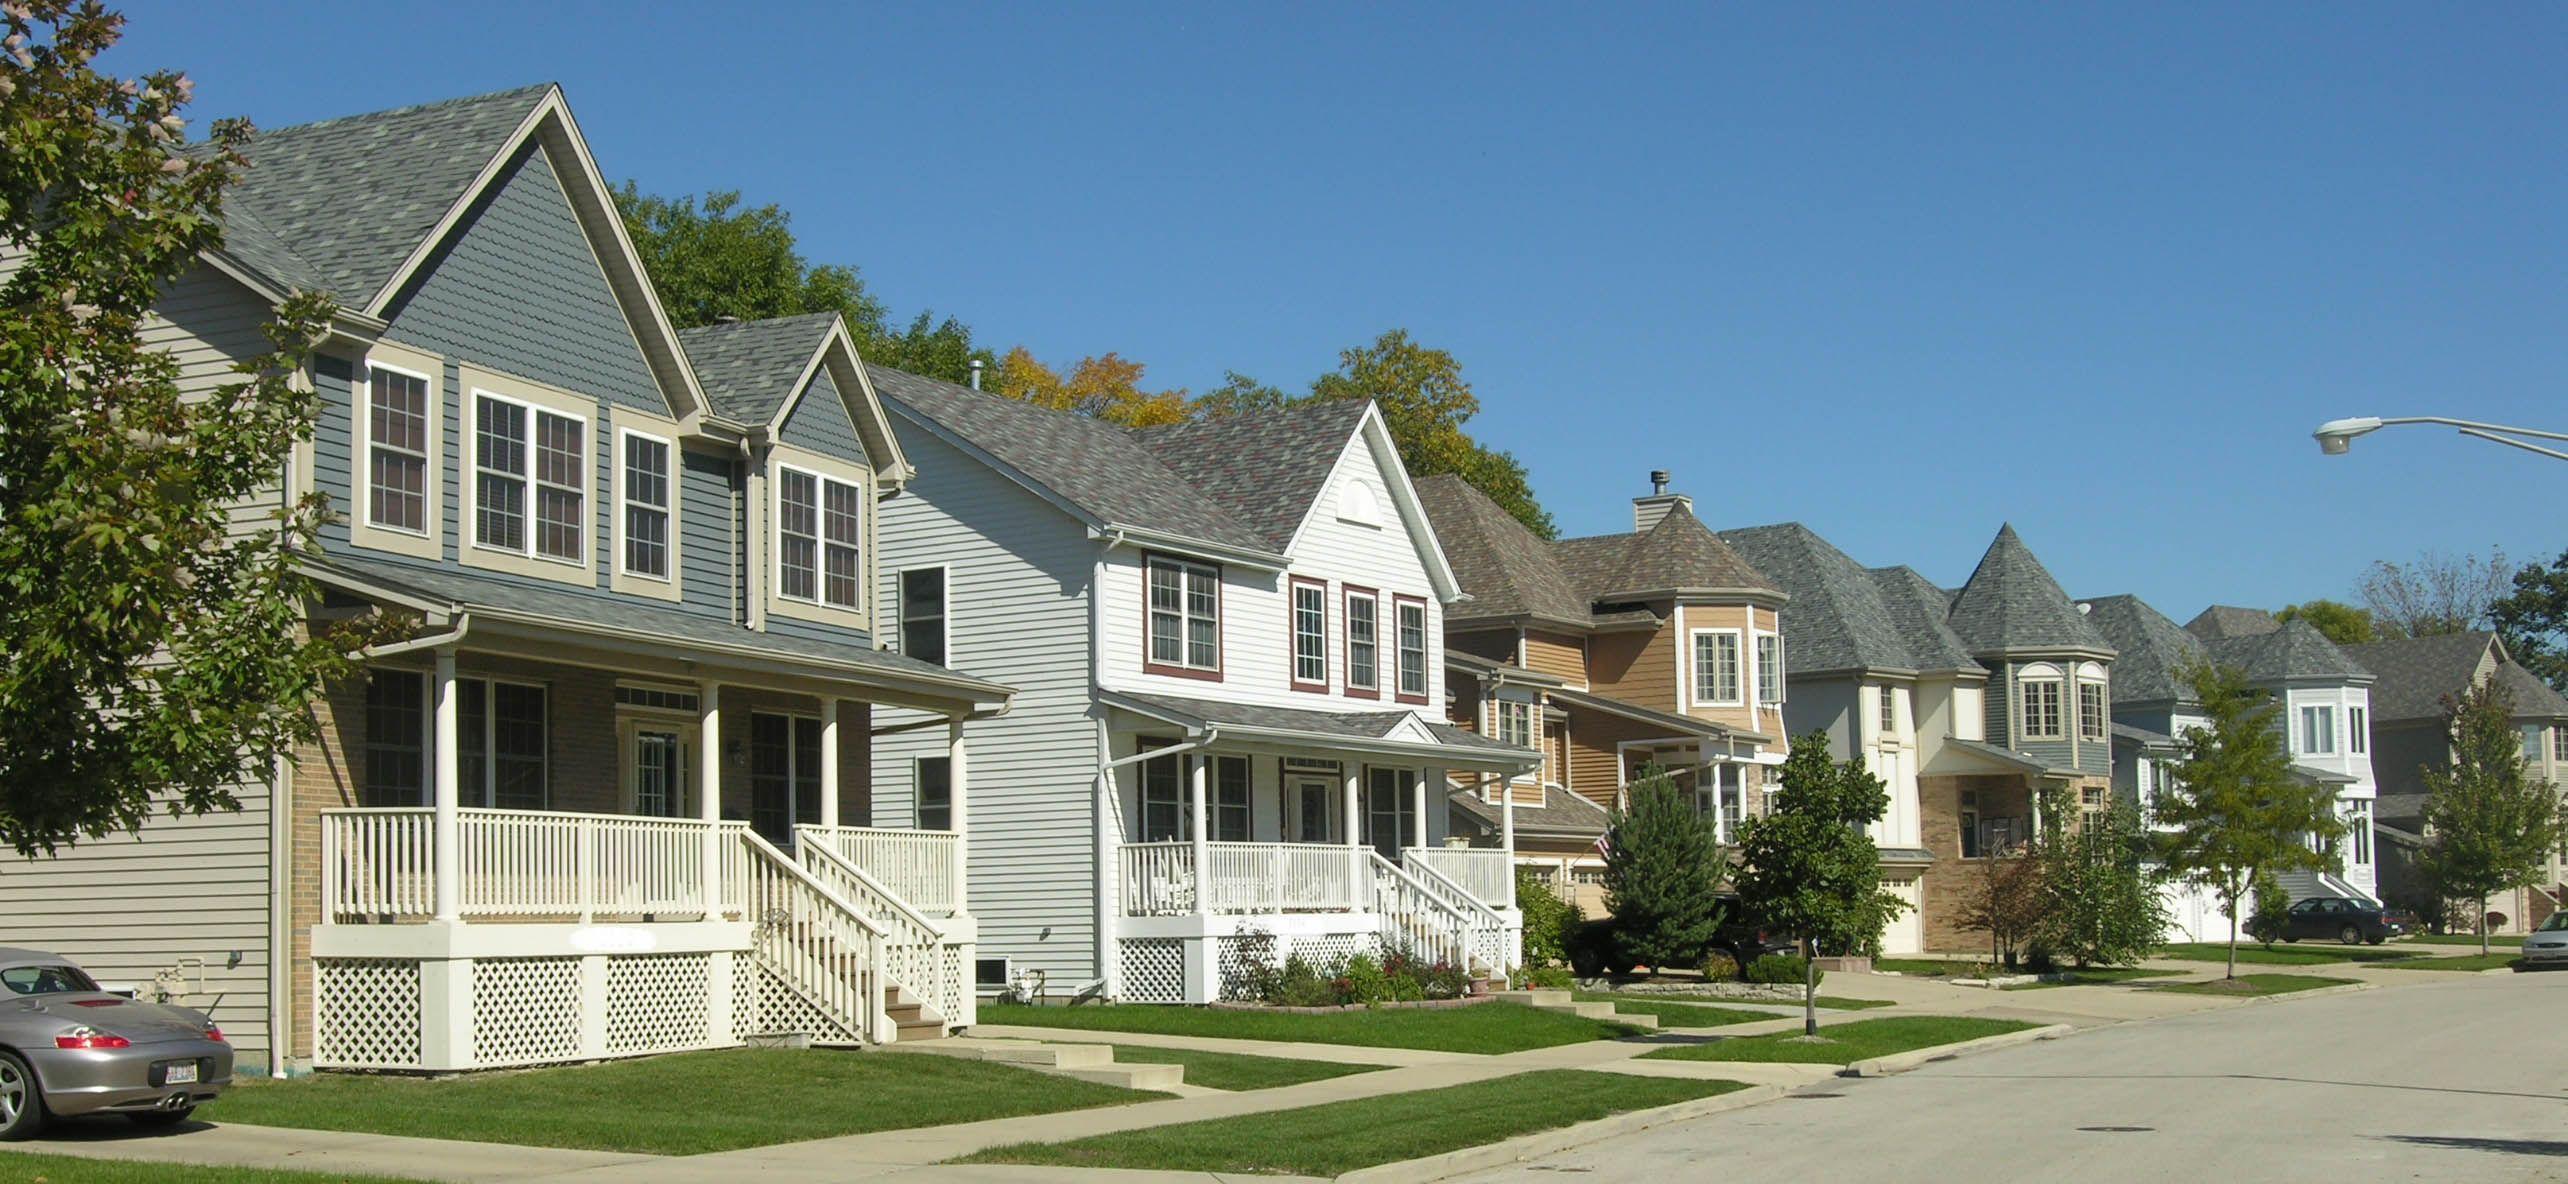 suburban neighborhood - Google Search